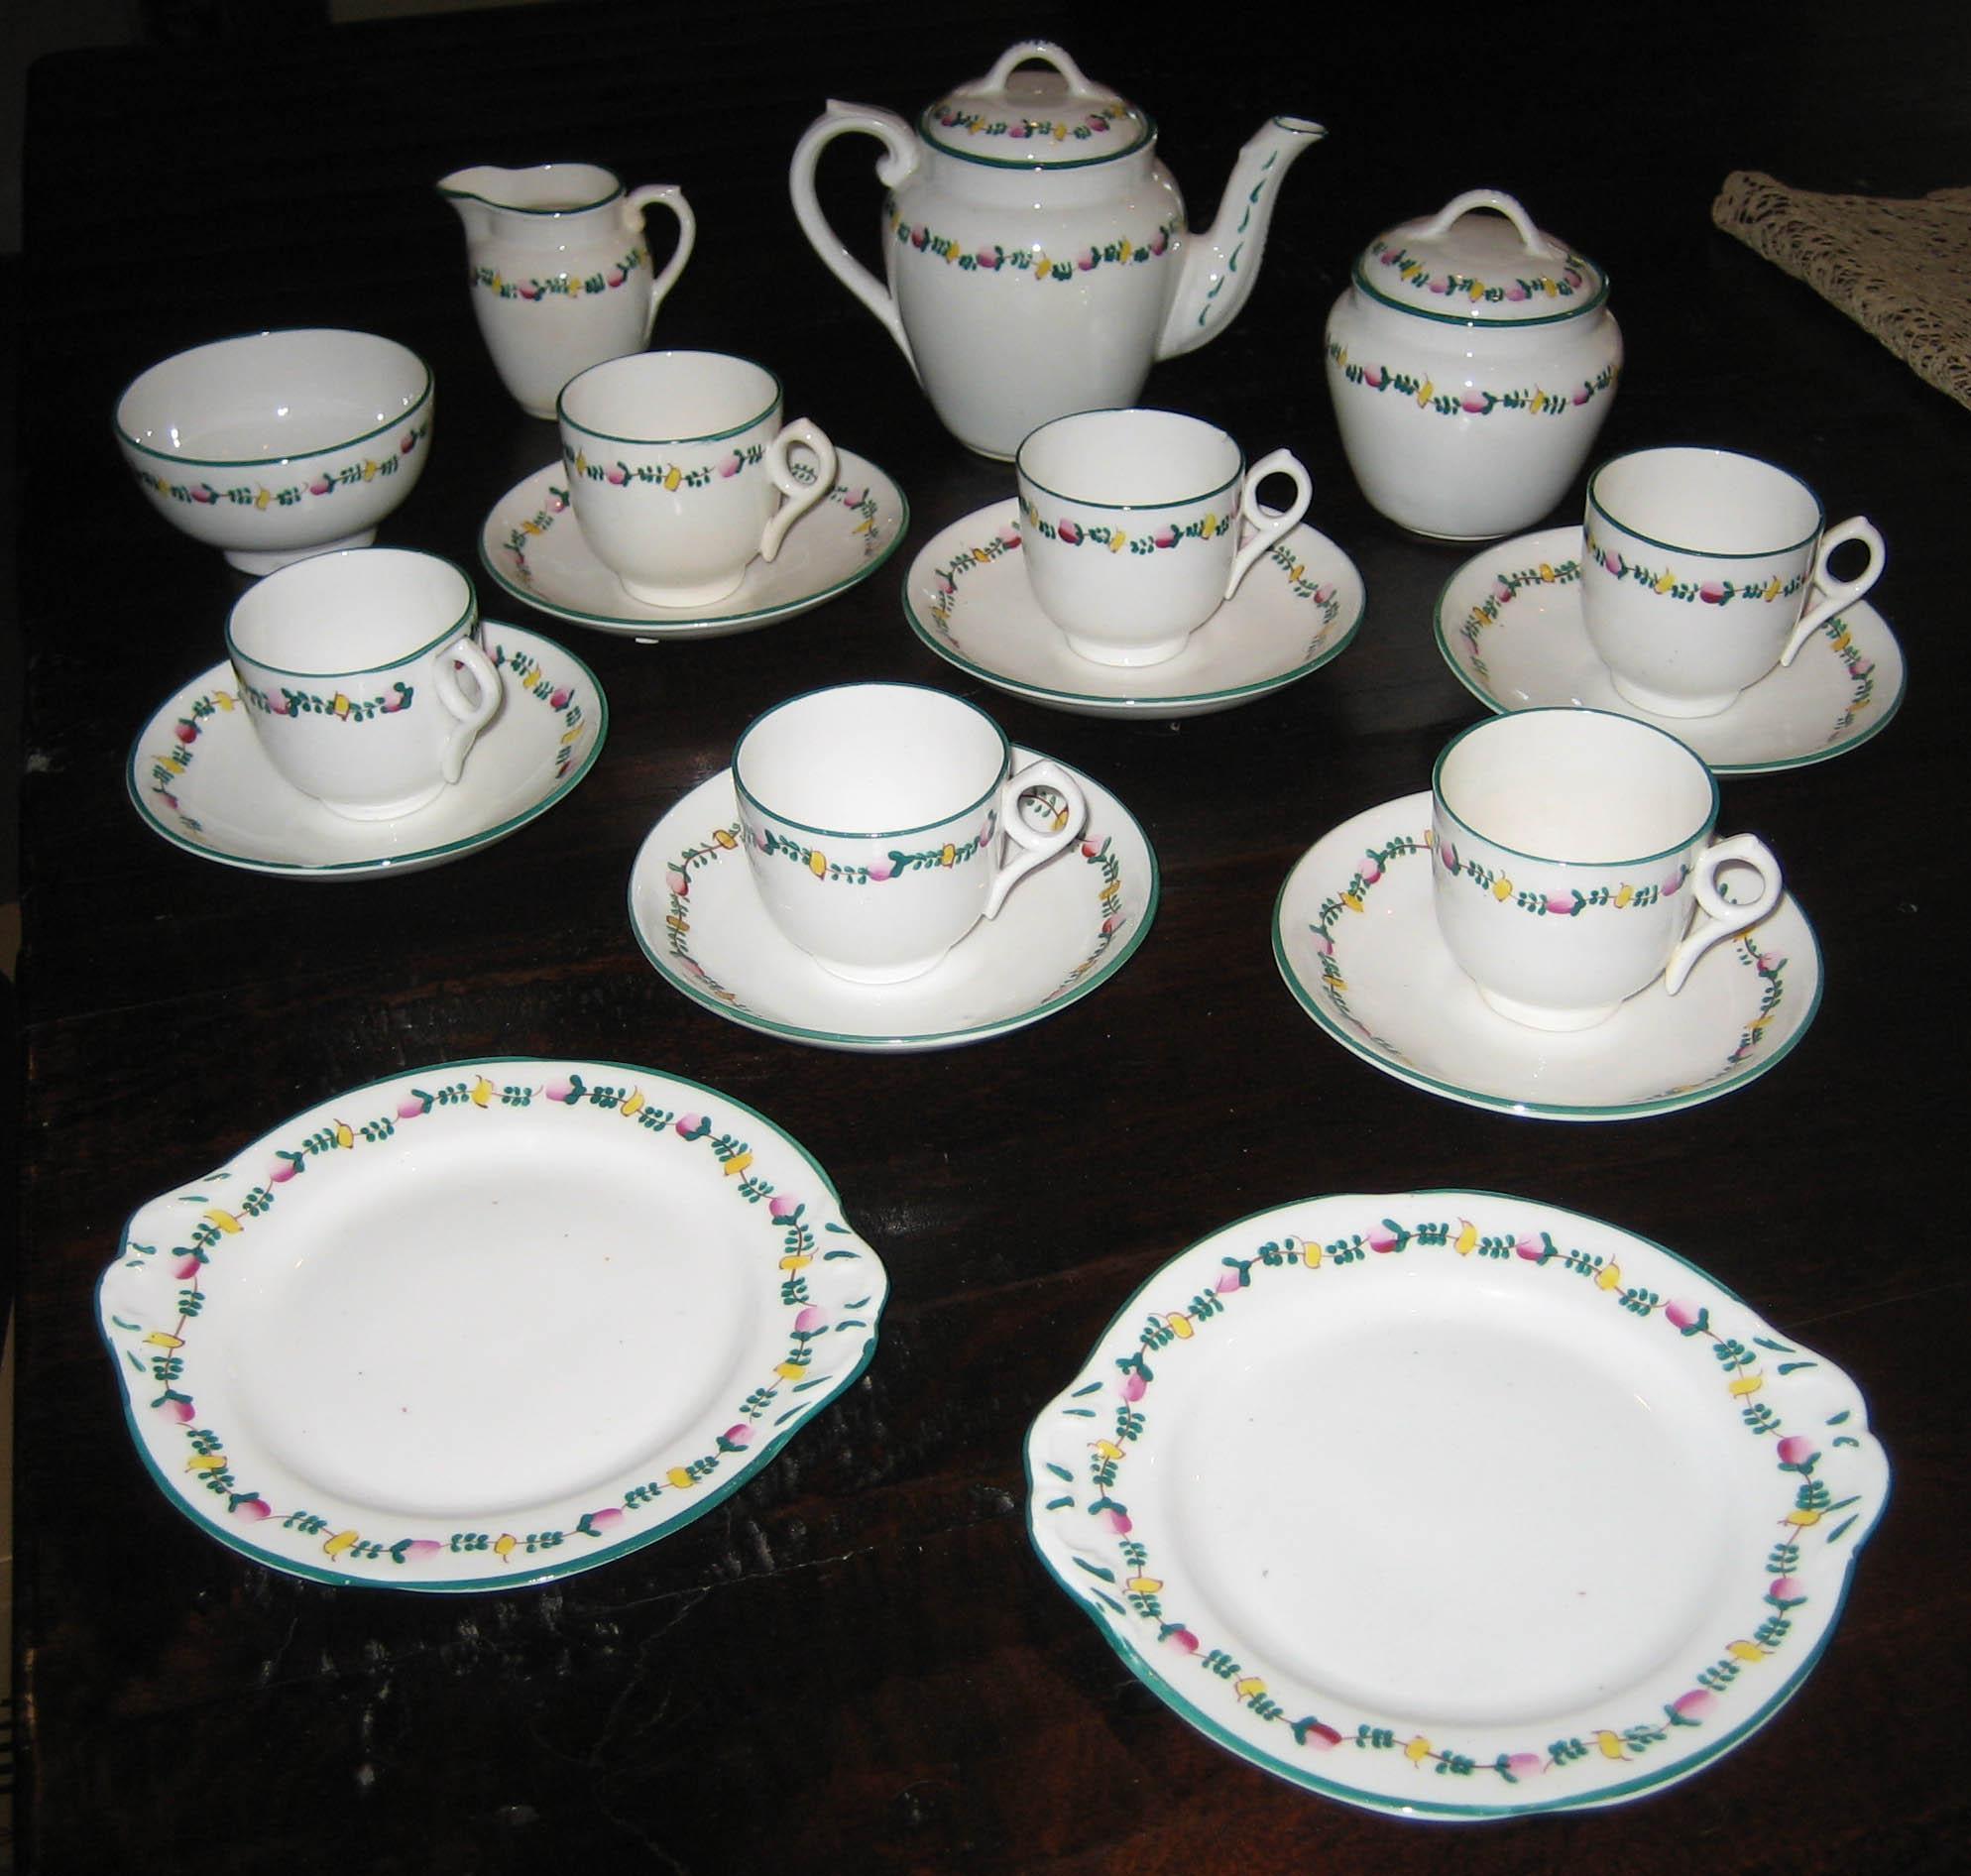 Toy Tea Set : Rare minton delicate flower band english antique toy tea